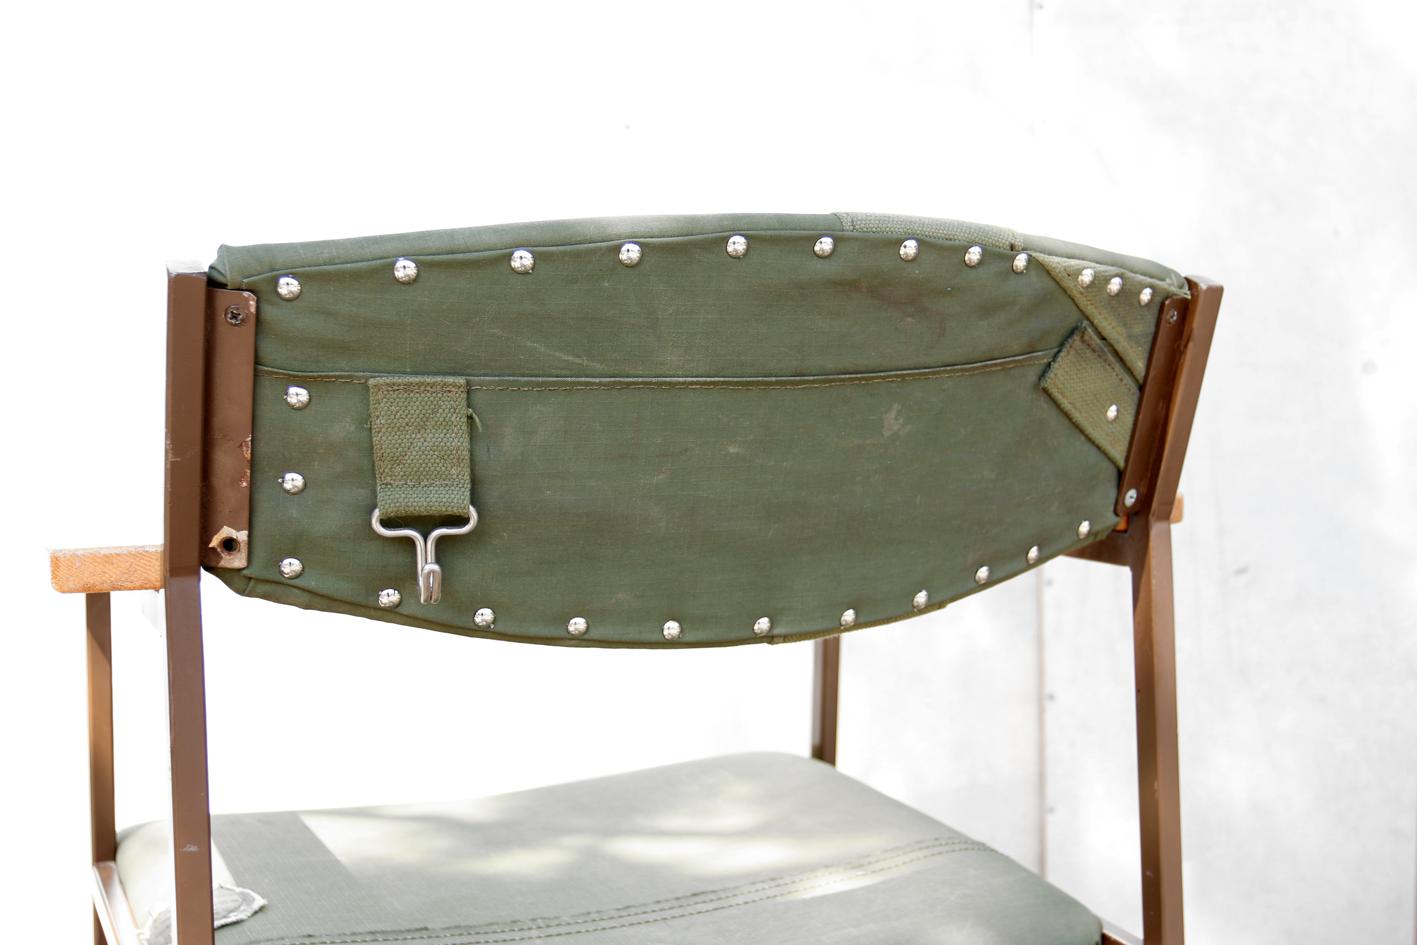 Industriele Vintage Stoelen.Industrieel Vintage Stoere Legertent Army Stoelen Uniek